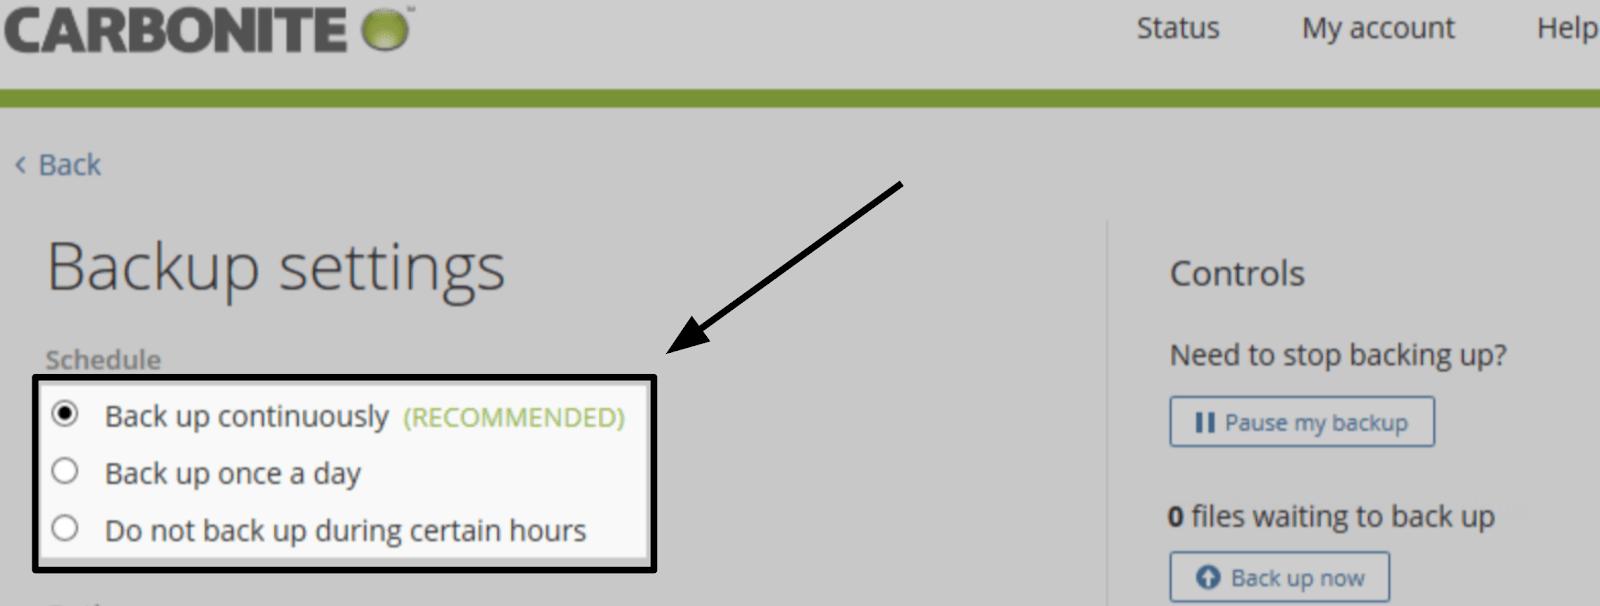 Carbonite Backup Schedule settings